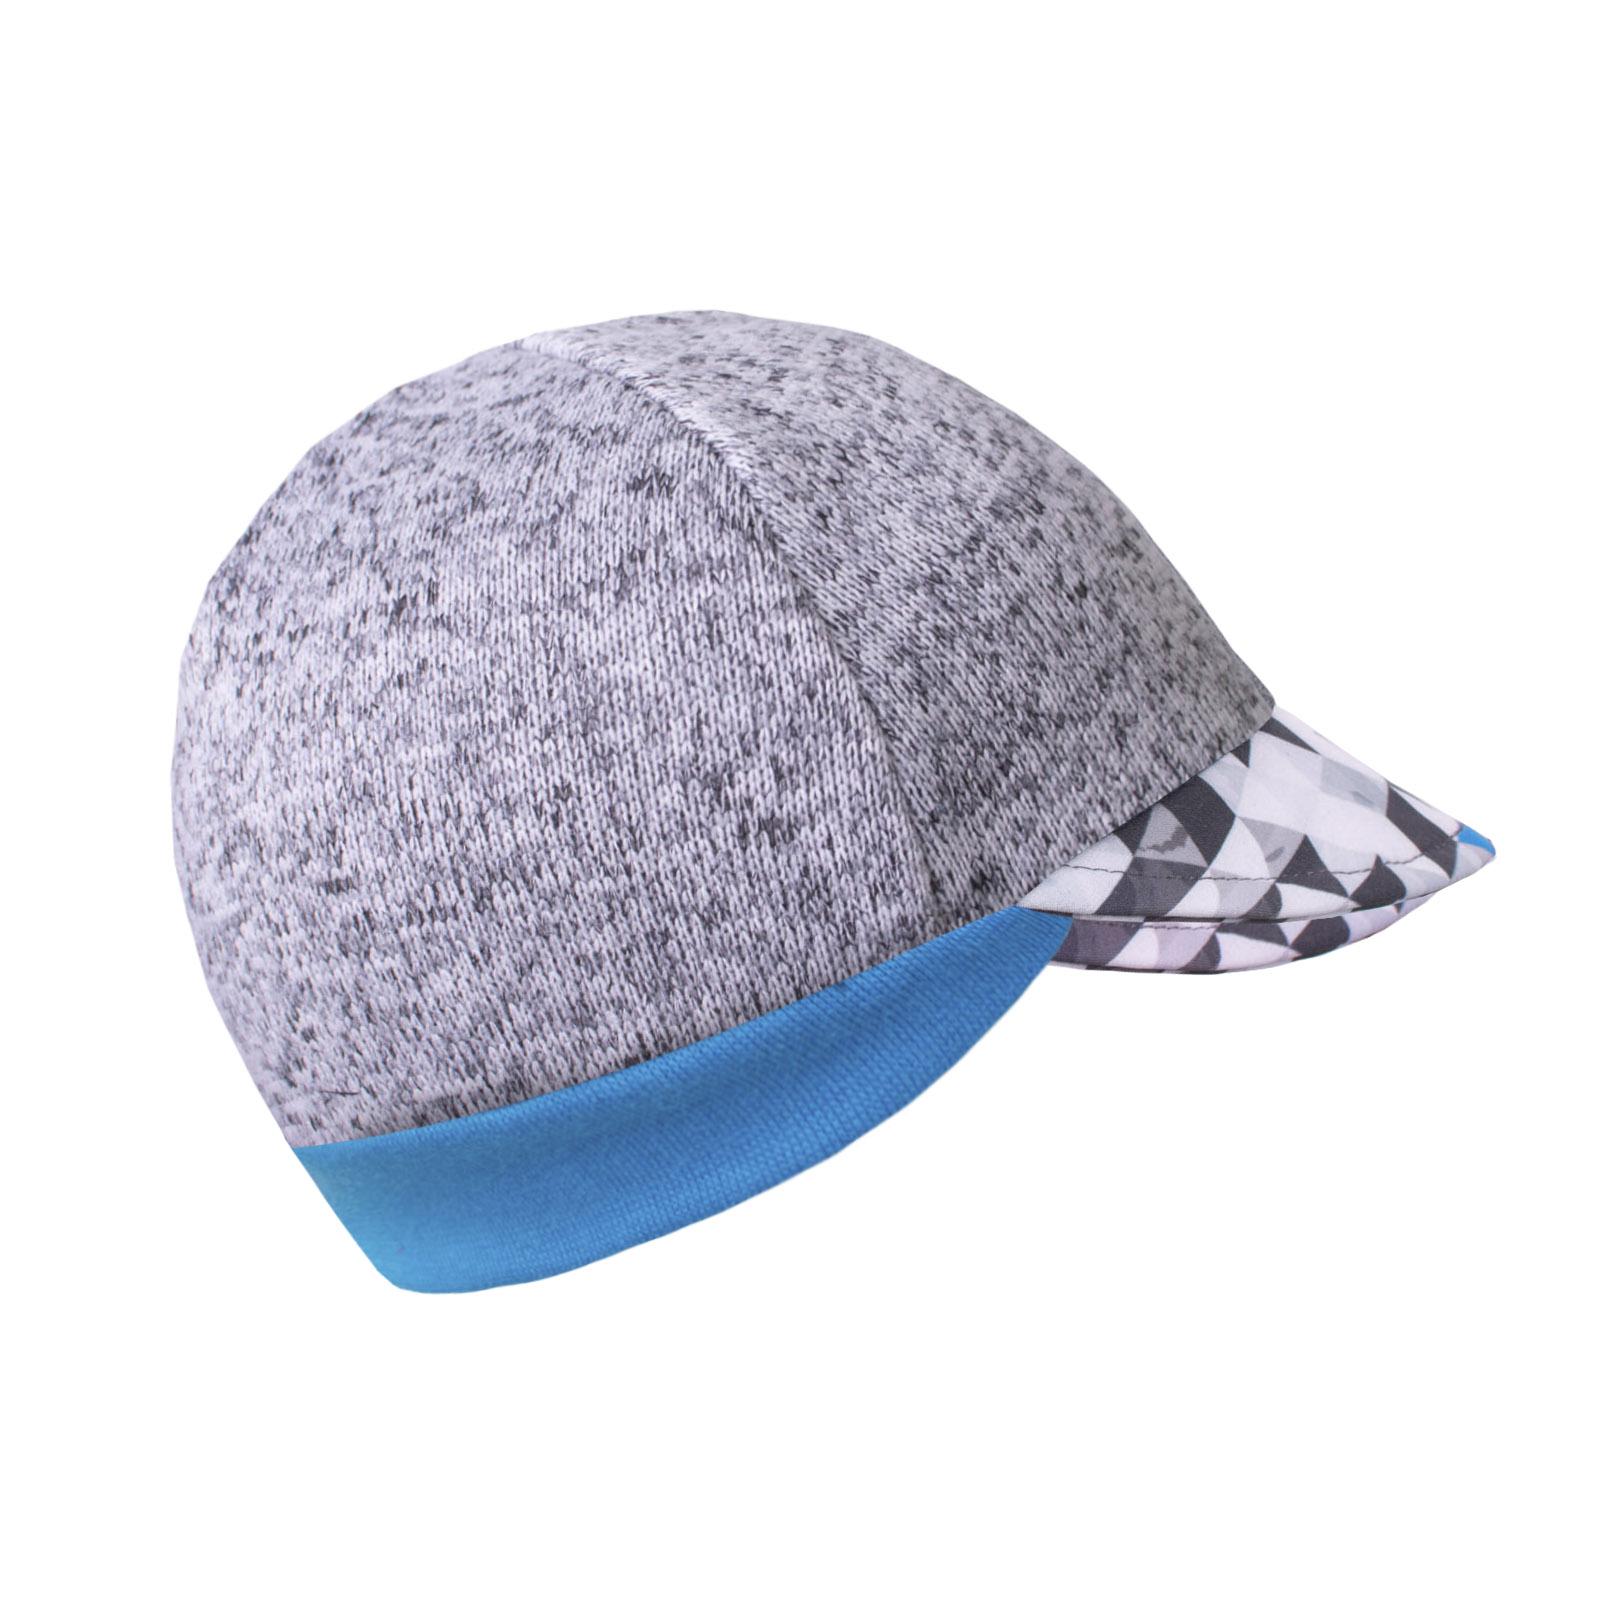 Unuo Svetrovinová čepice s kšiltem, Melír sv. šedá, Metricon kluk Velikost: S (45 - 48 cm)